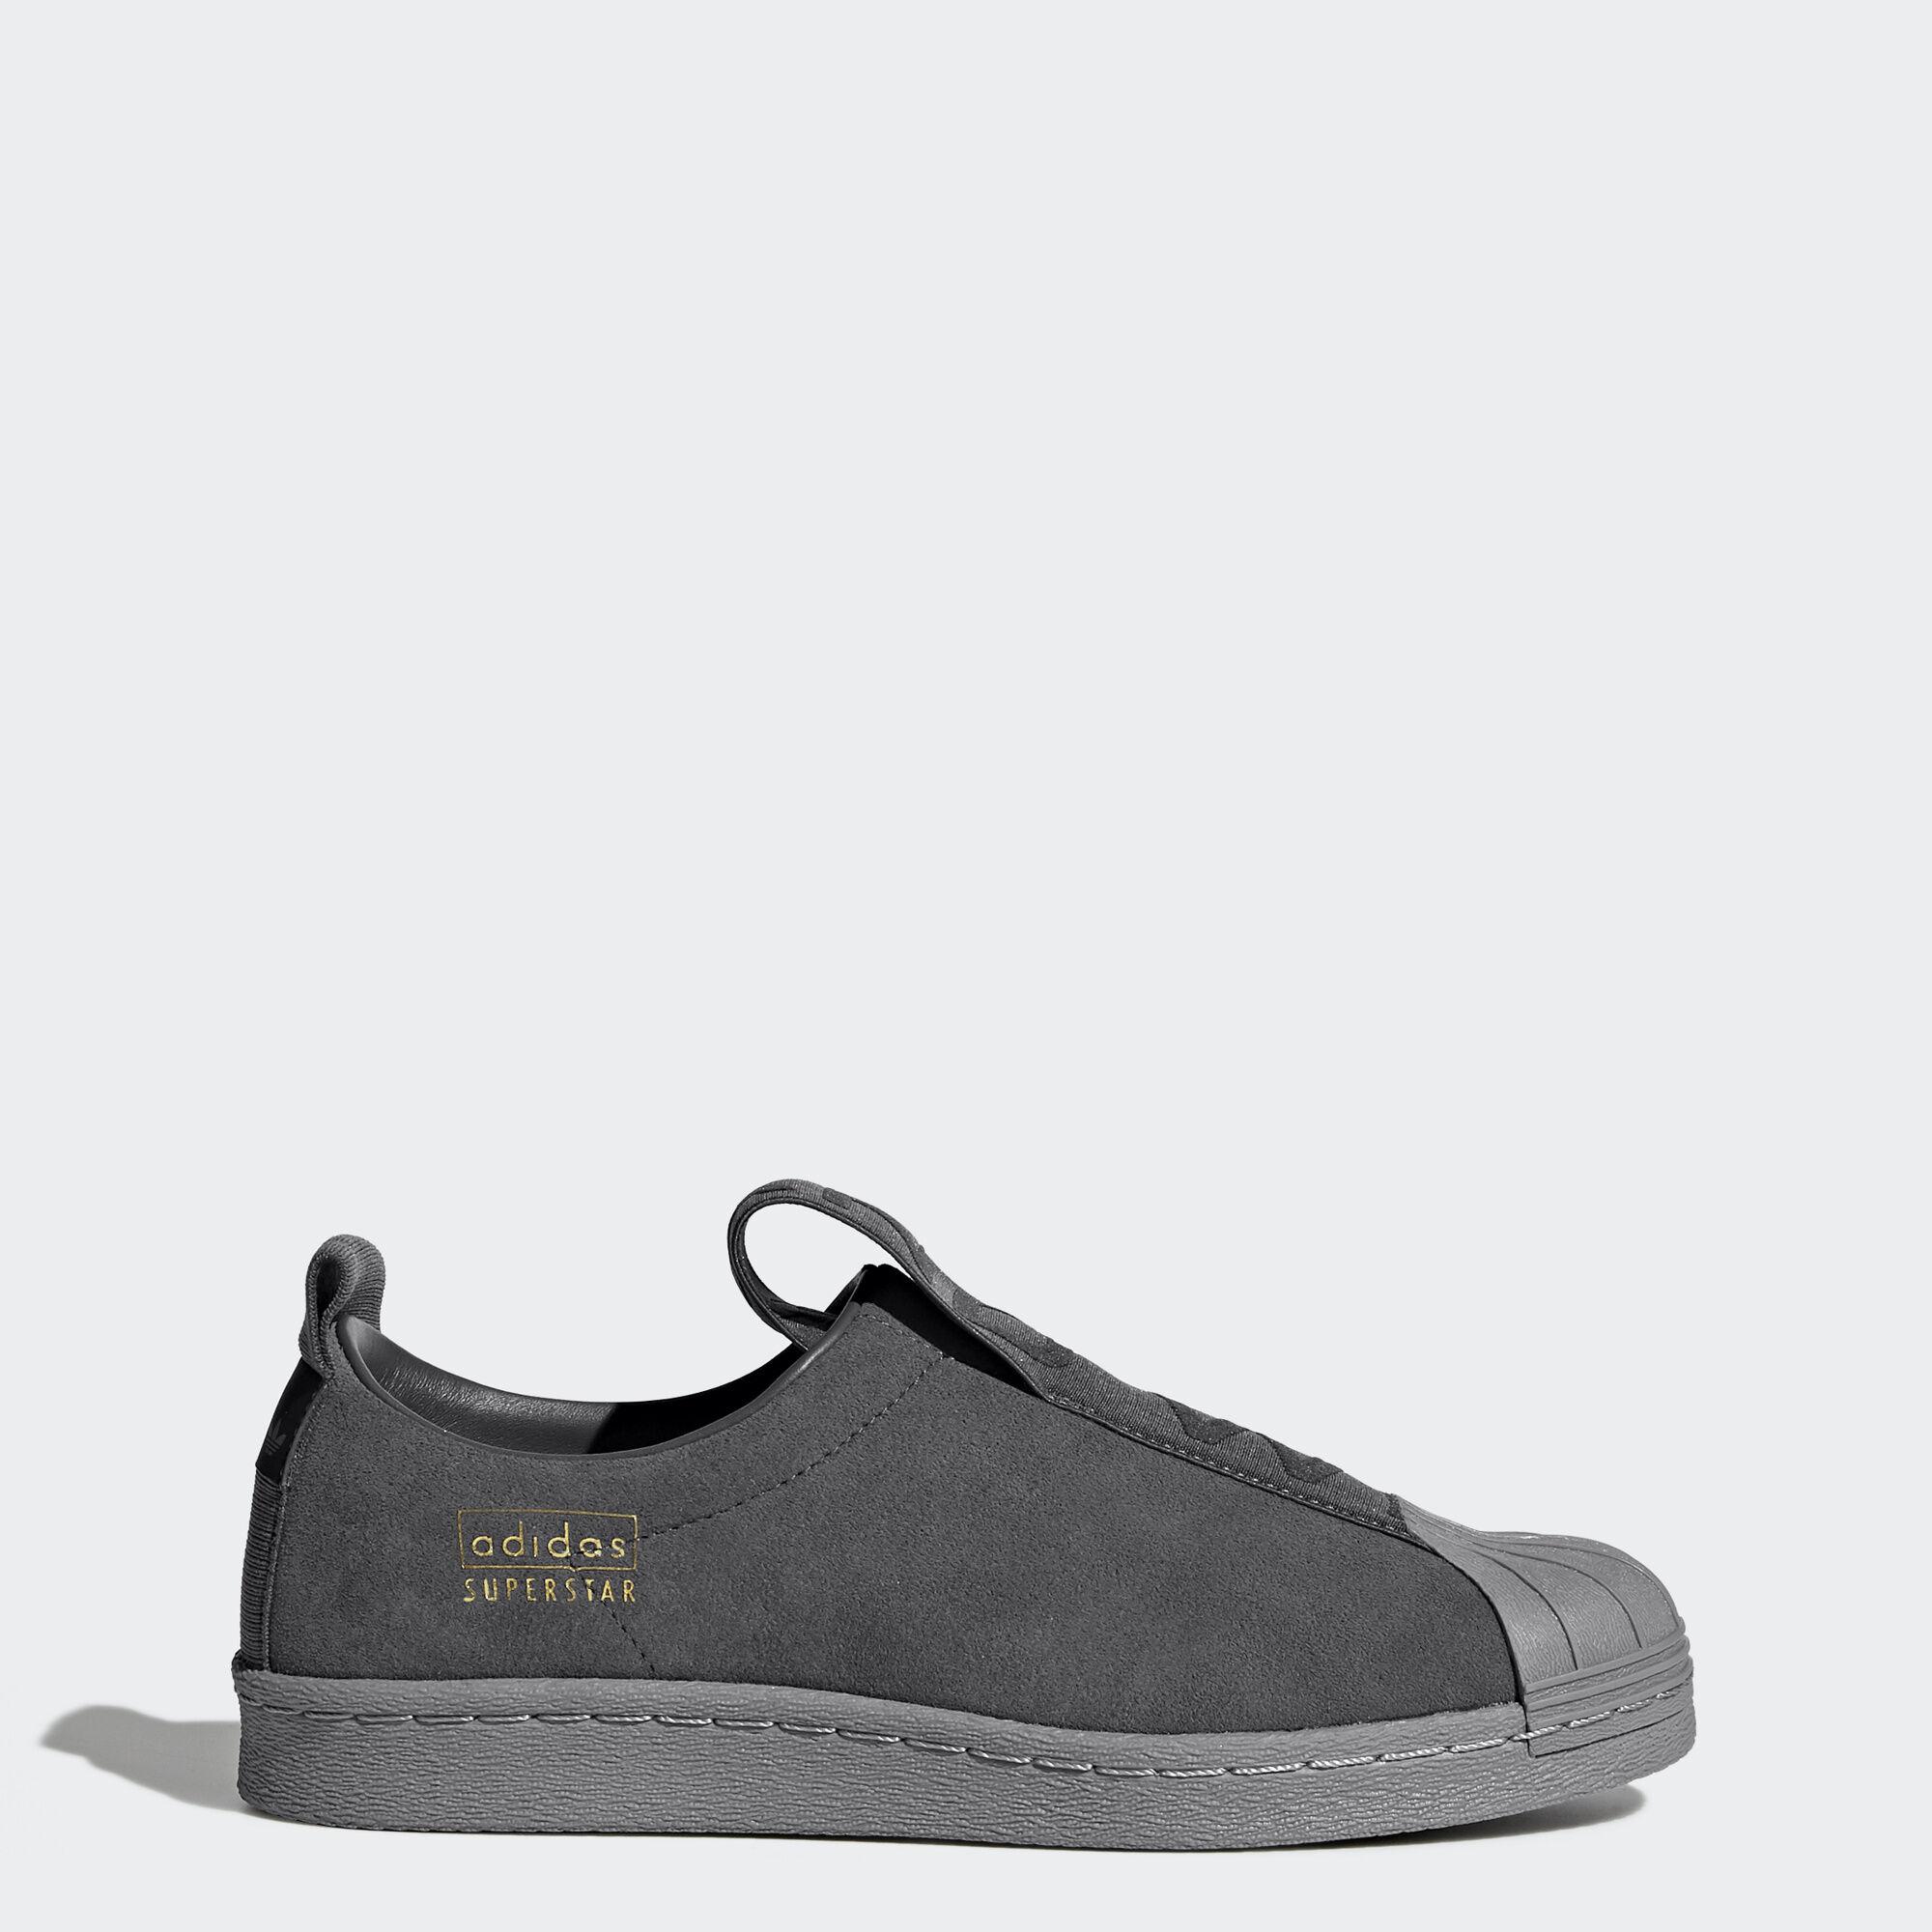 adidas - Superstar BW Slip-On Shoes Grey Five/Grey Three CG3695